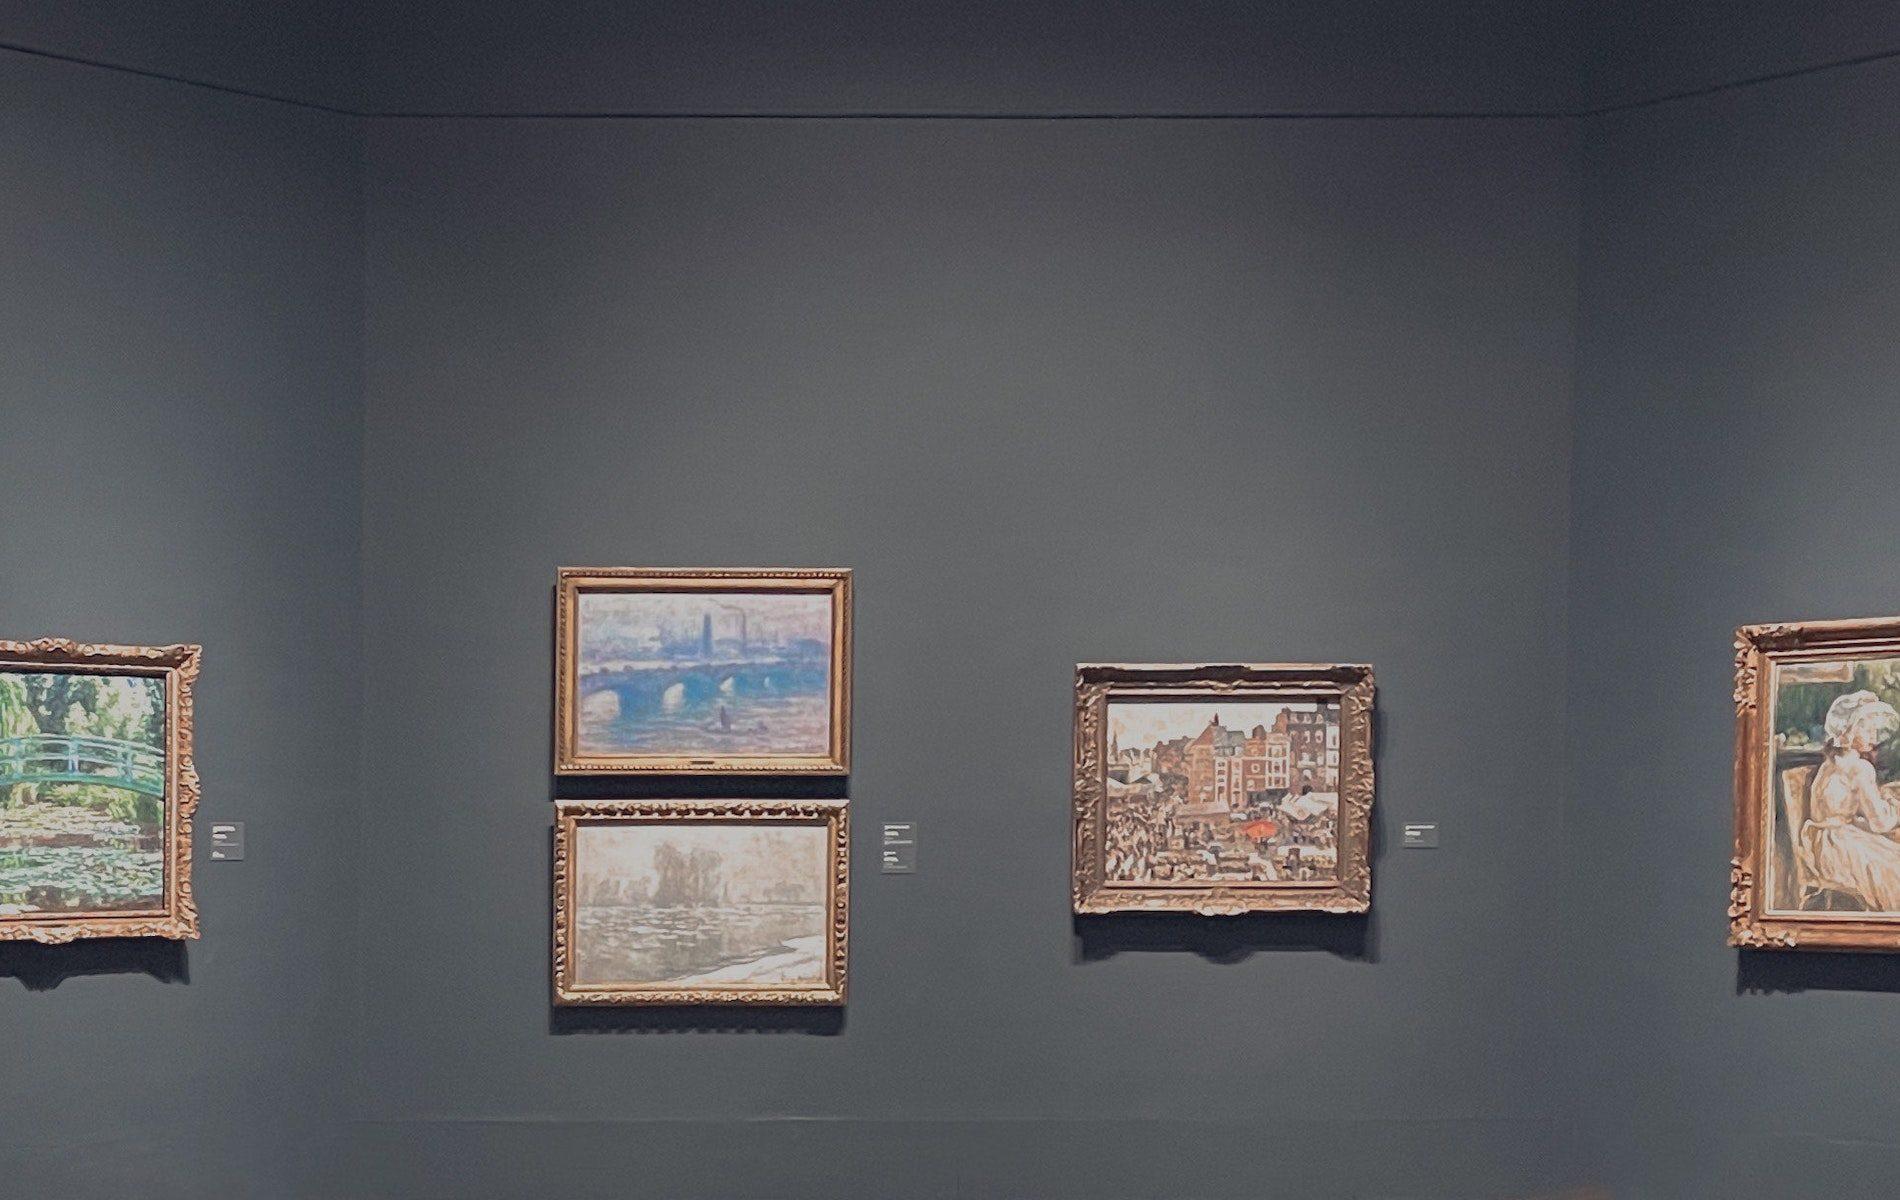 5 framed monet painting on dark grey wall